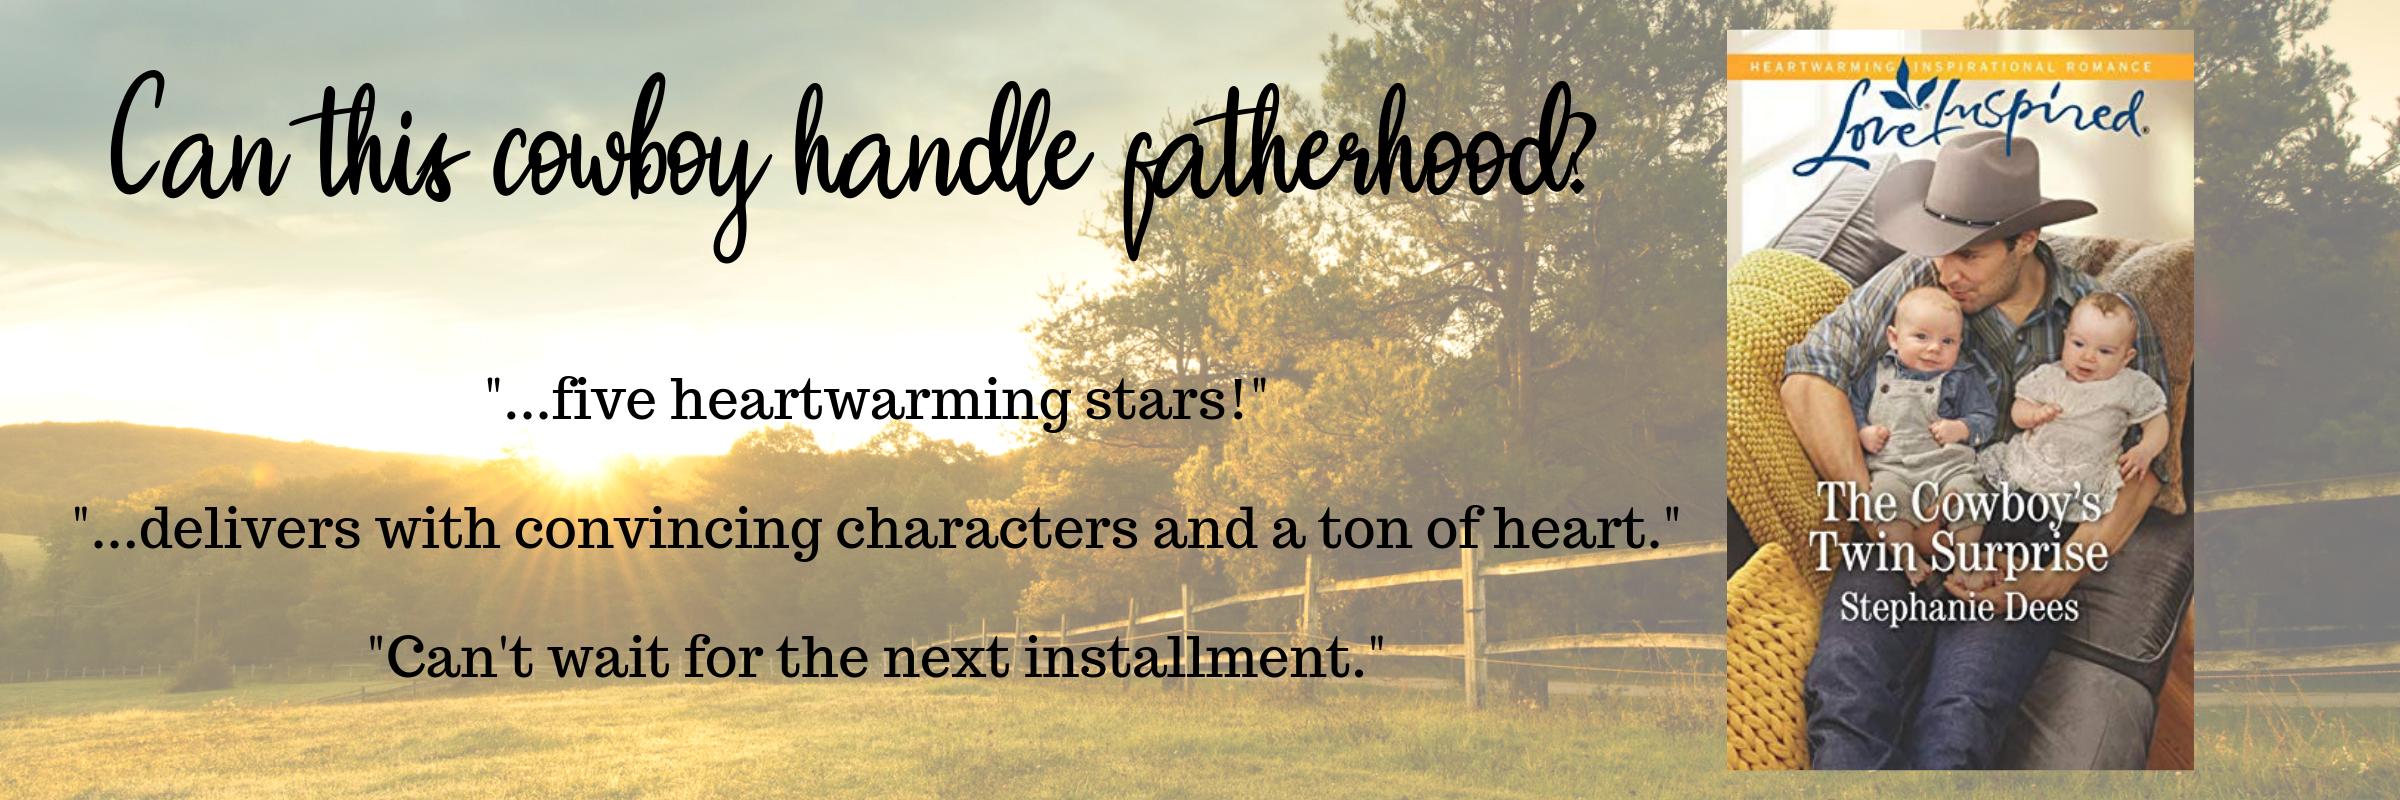 Can this cowboy handle fatherhood_ (2)